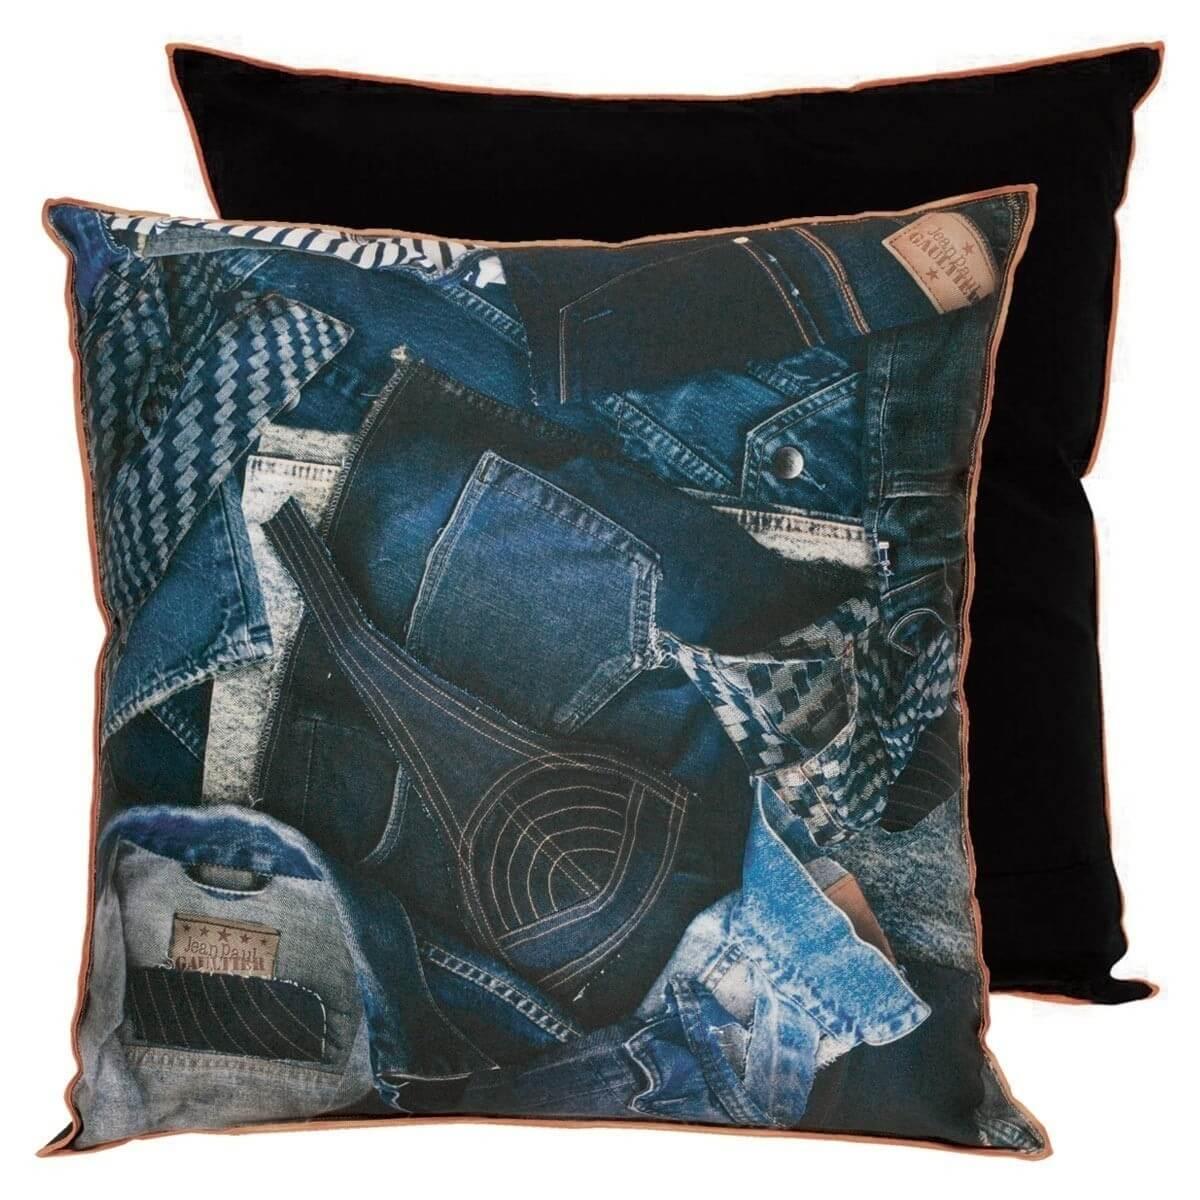 coussin america jean paul gaultier. Black Bedroom Furniture Sets. Home Design Ideas